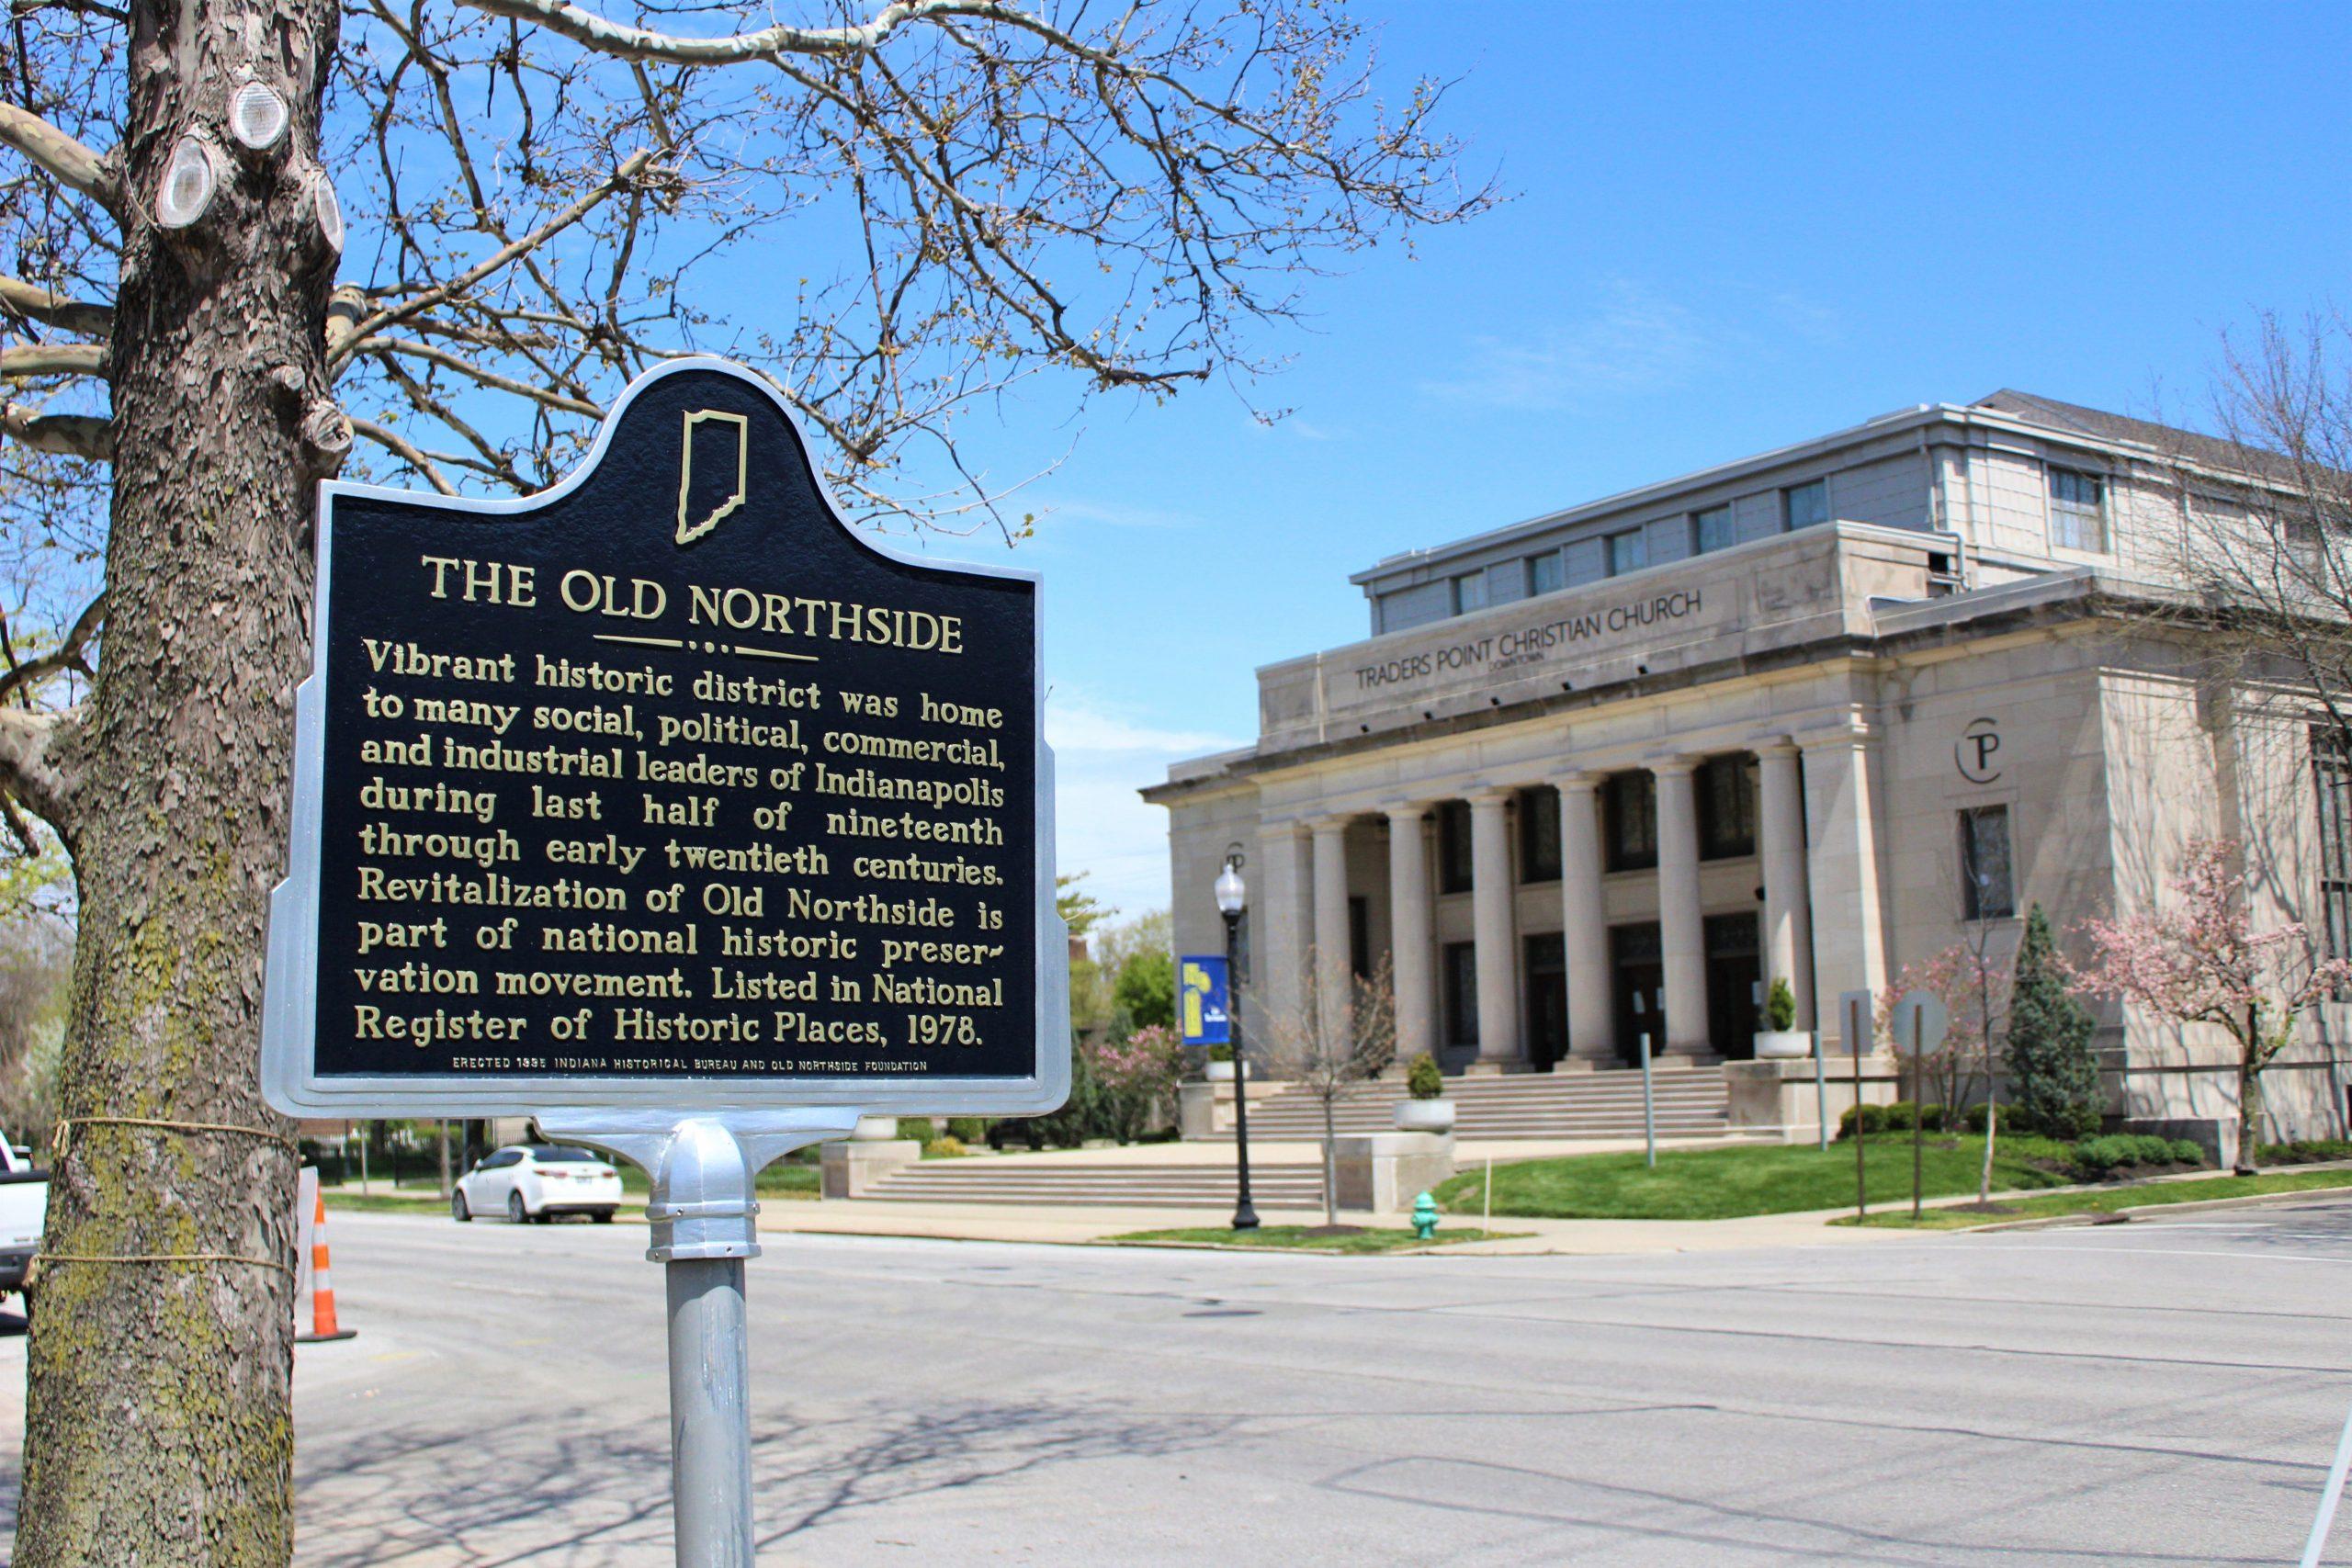 Old Northside - Historic District